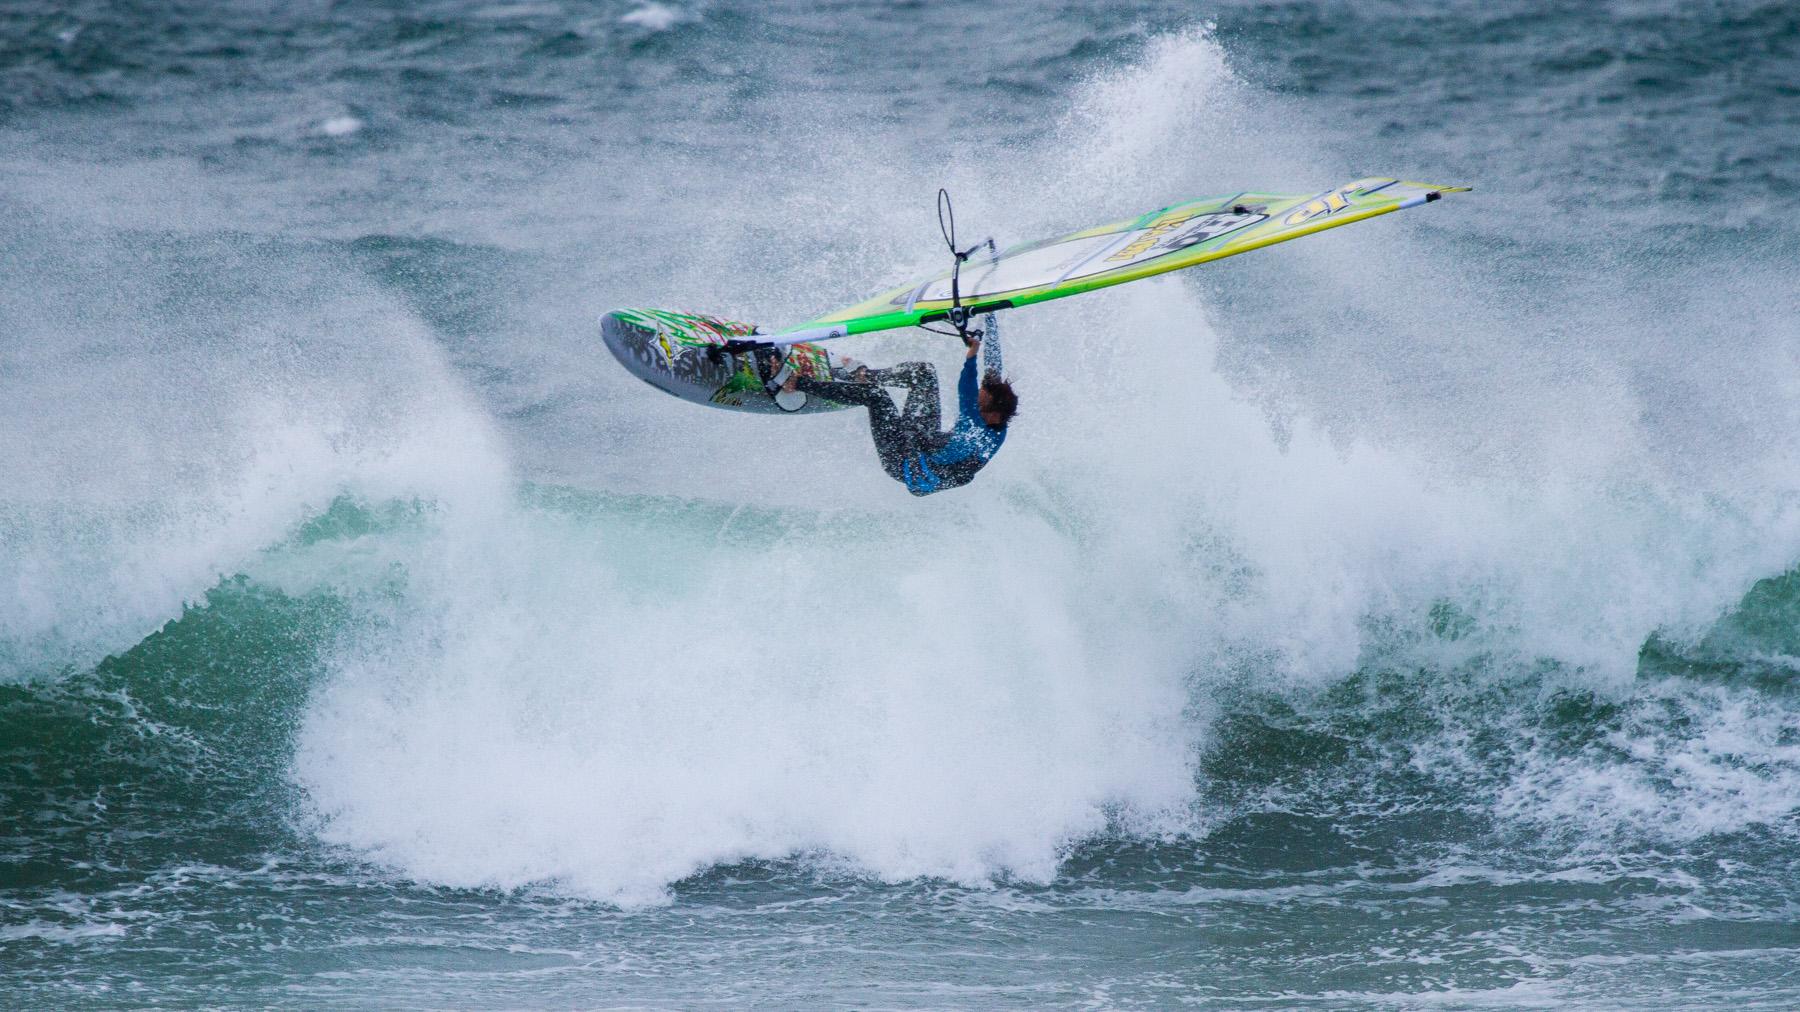 alastair mcleod windsurfing waratah bay victoria